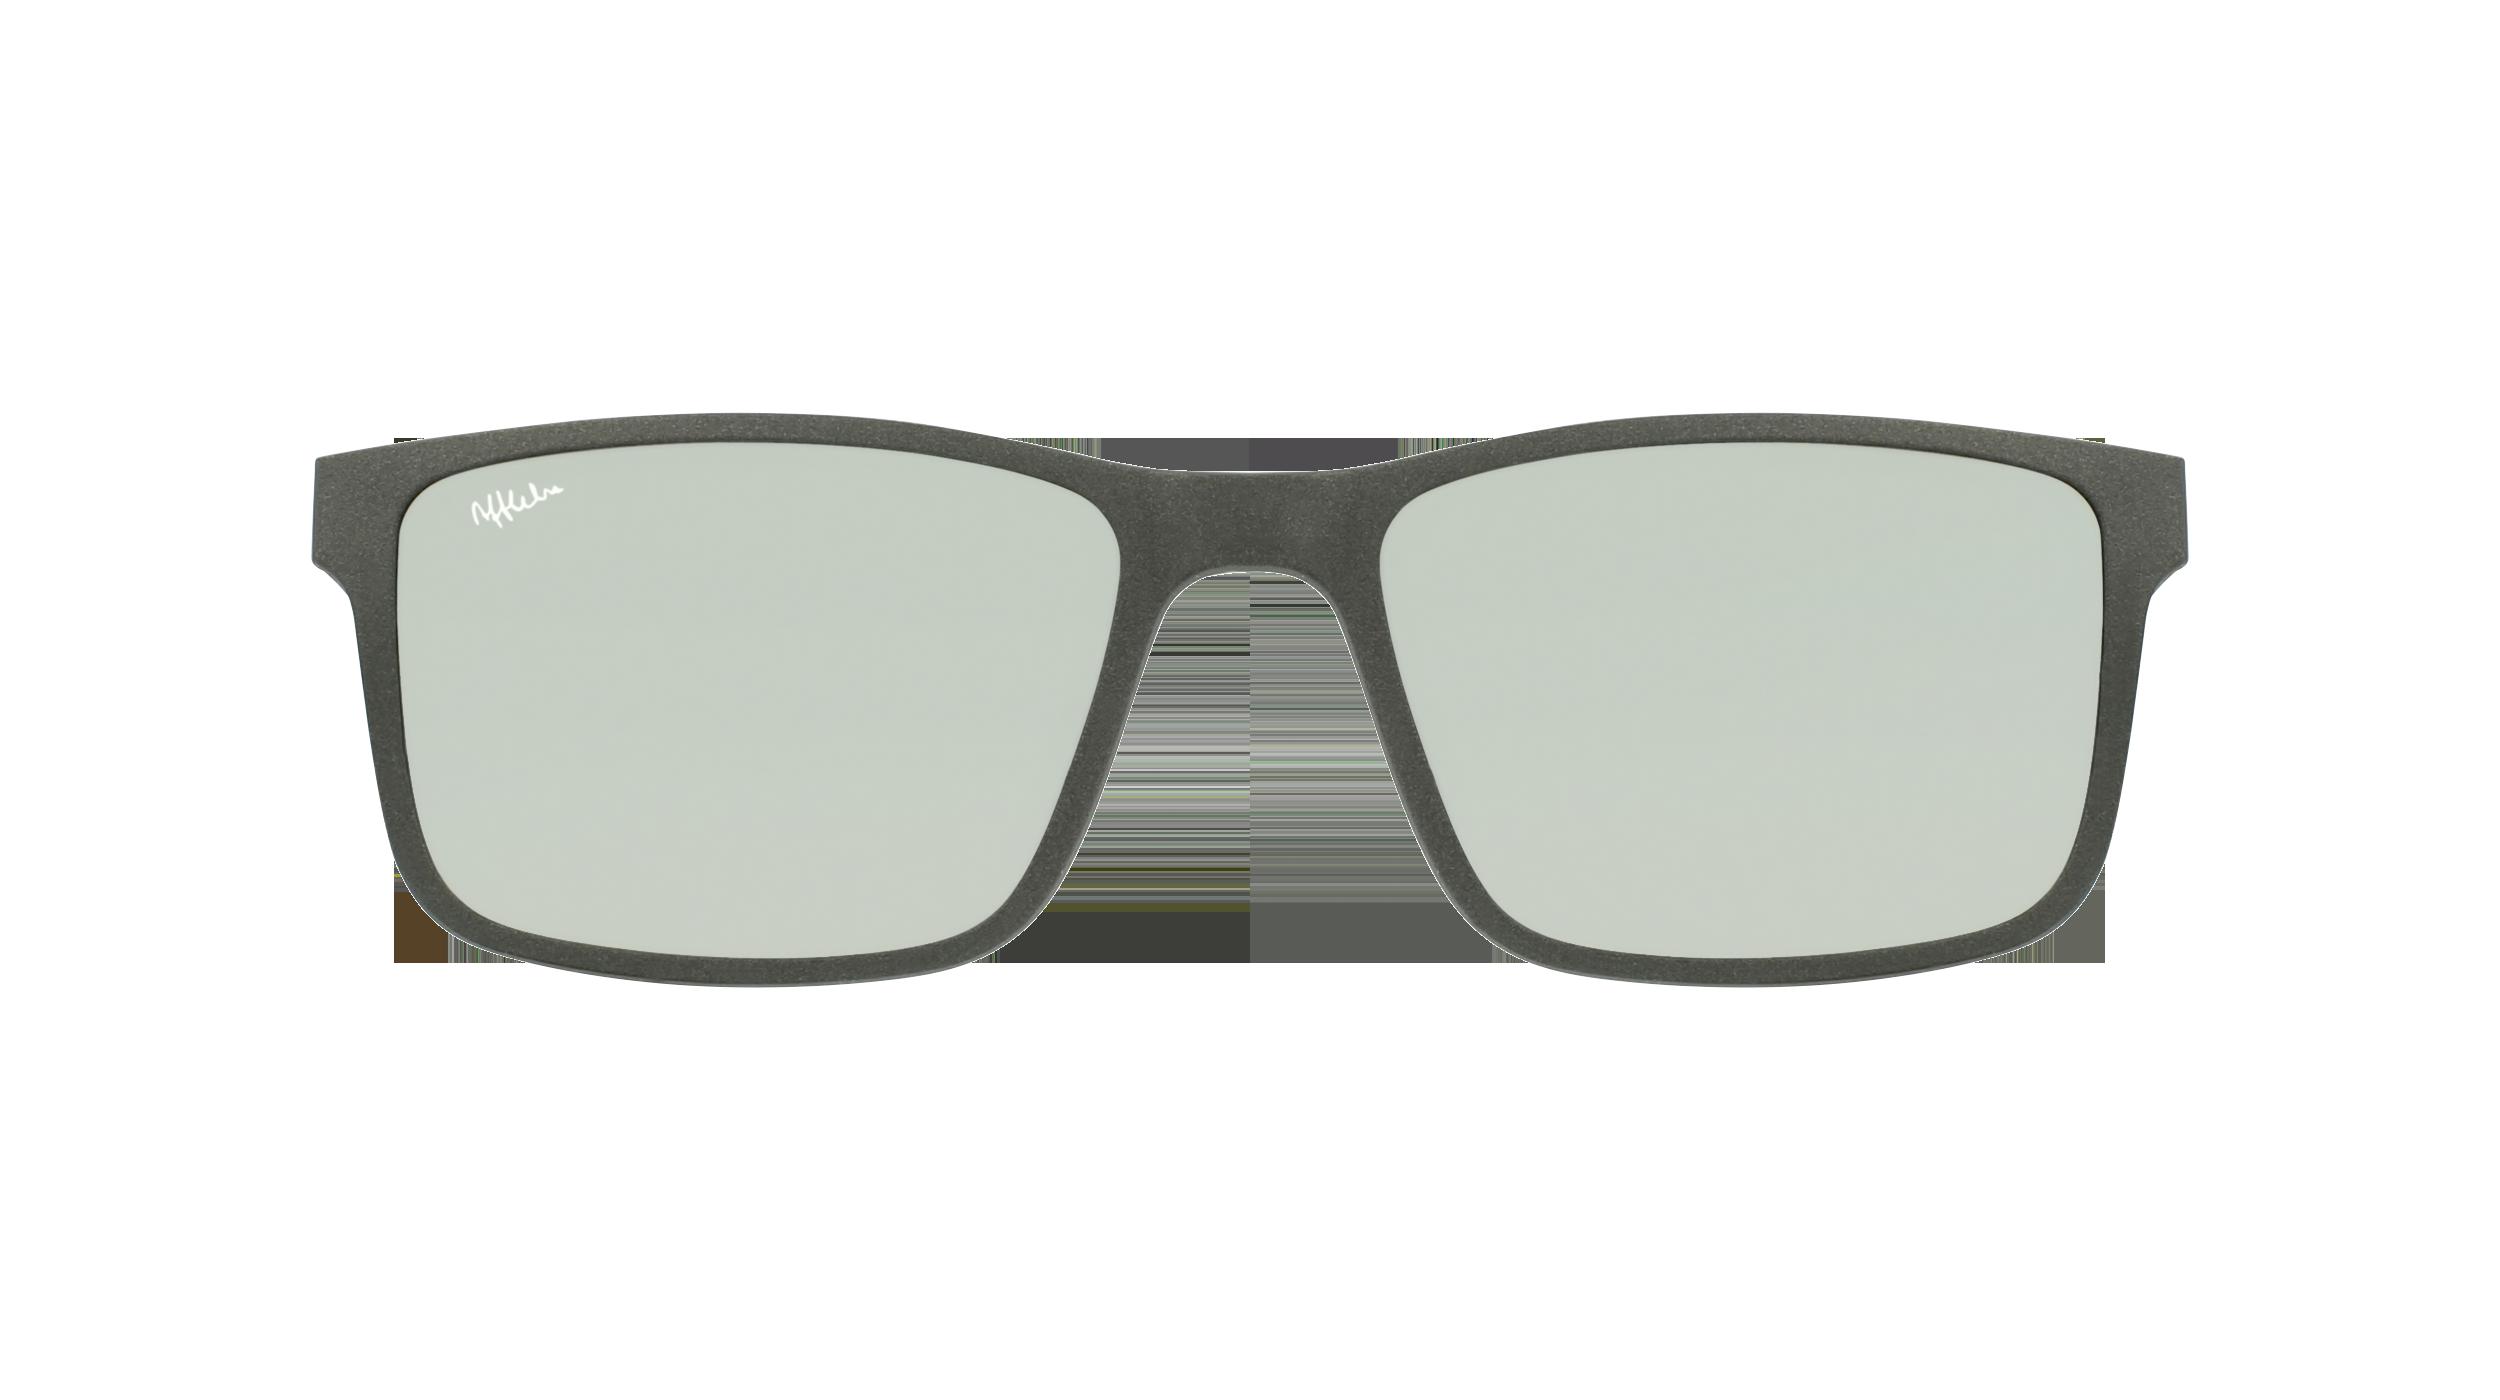 afflelou/france/products/smart_clip/clips_glasses/07630036457528.png